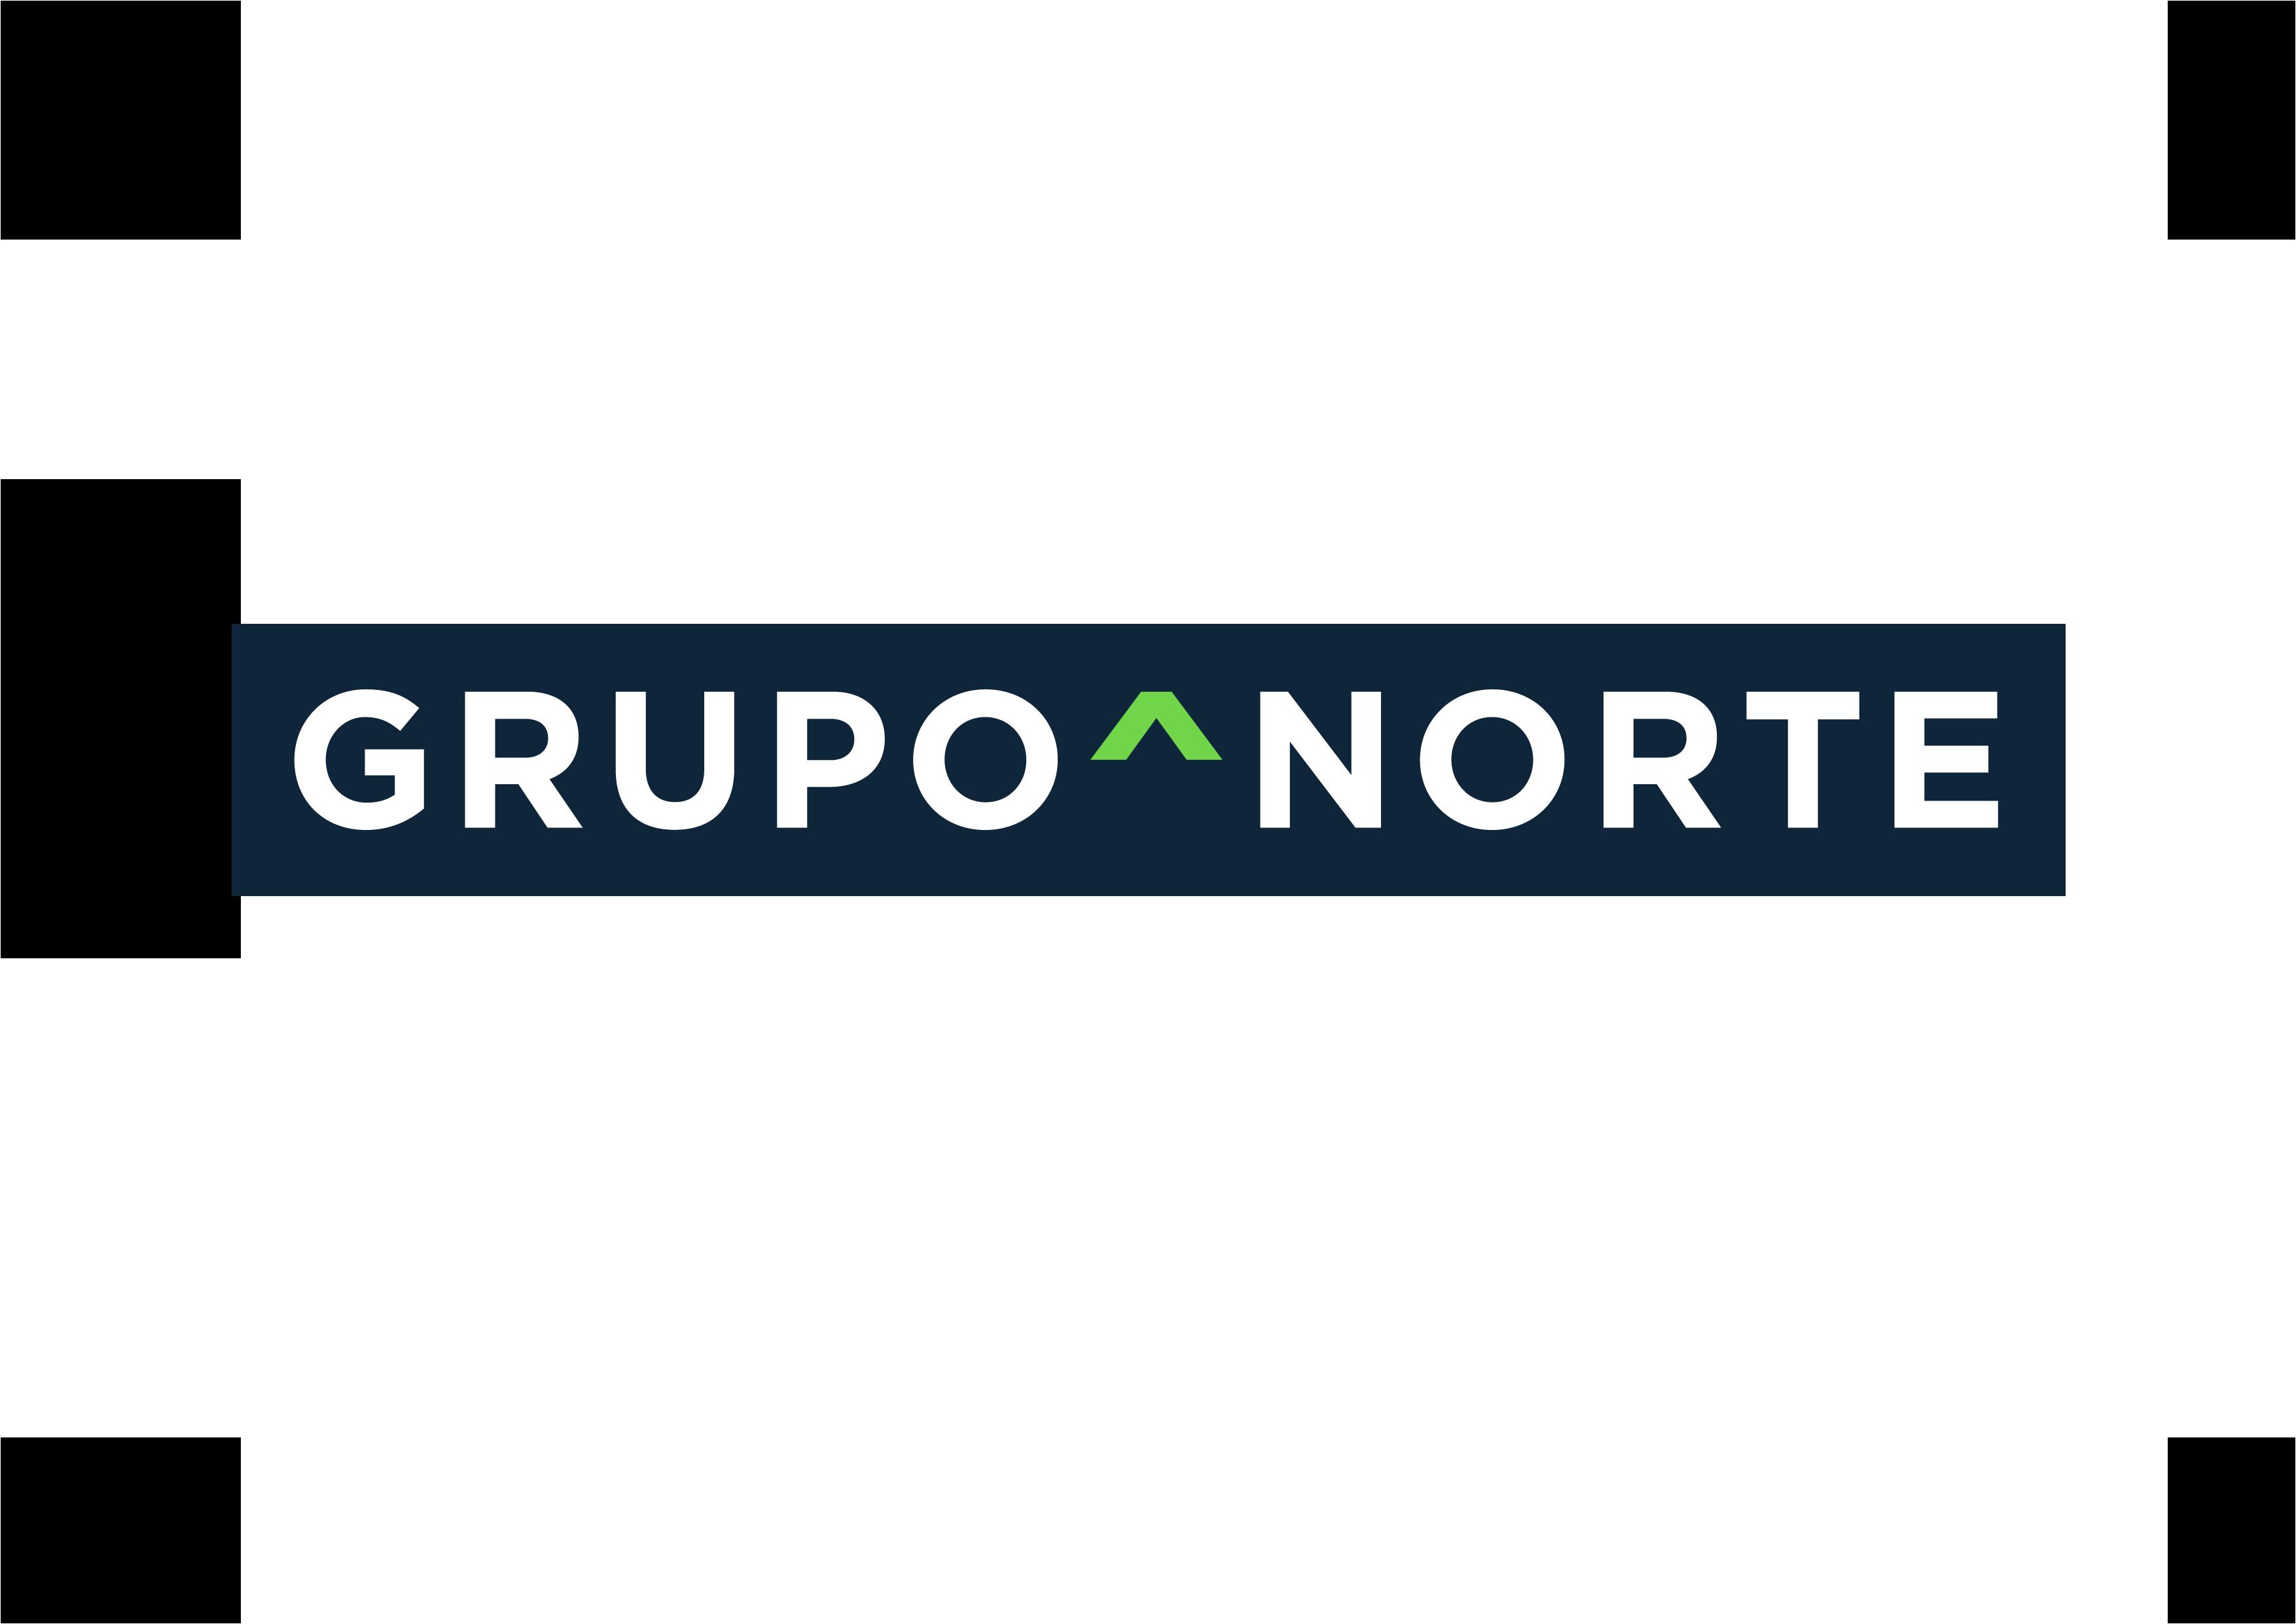 Presentaci n grupo norte for Grupo el norte